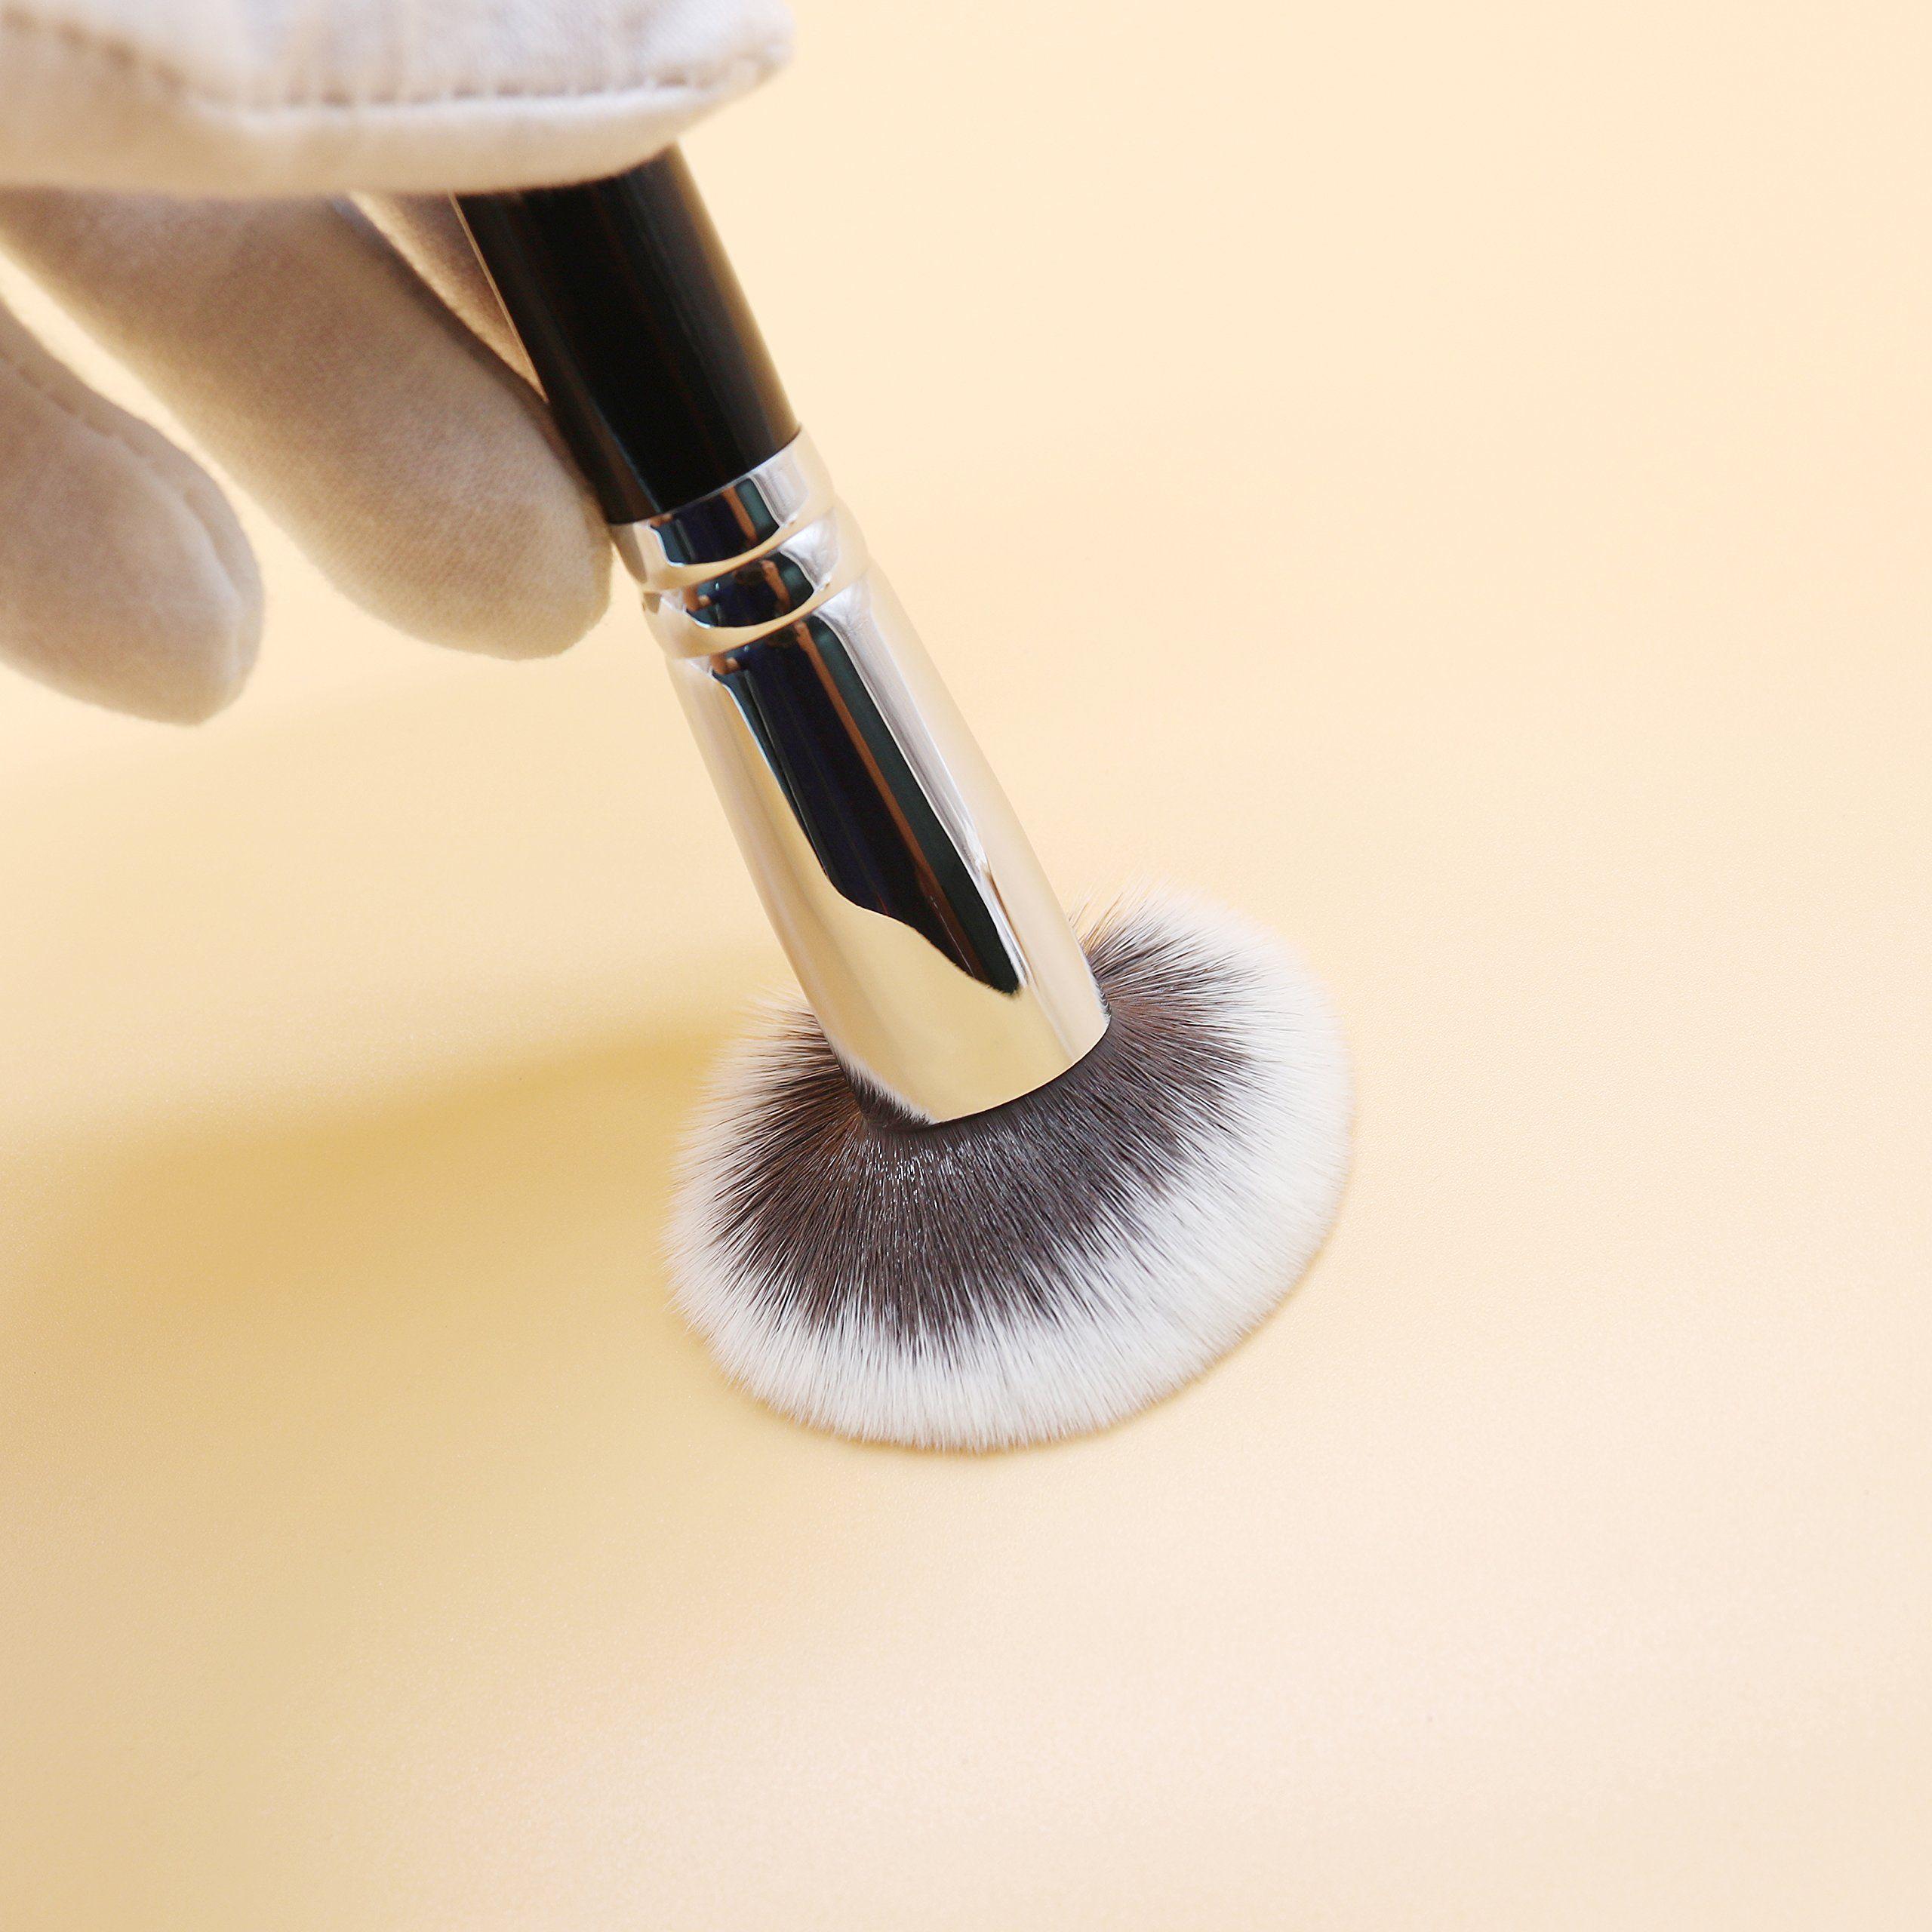 Cruelty Free Kabuki Brush Powder Blending Blush Buffing